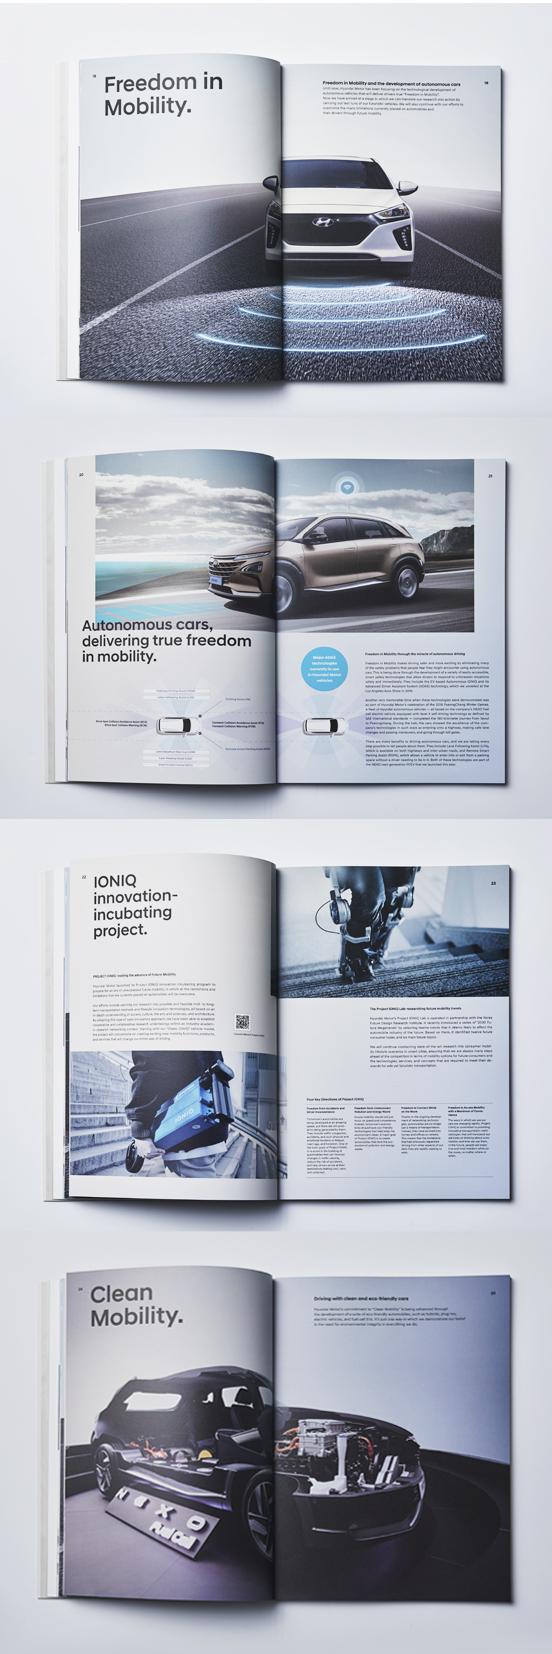 2018 Hyundai Motor Company PR Brochure-4